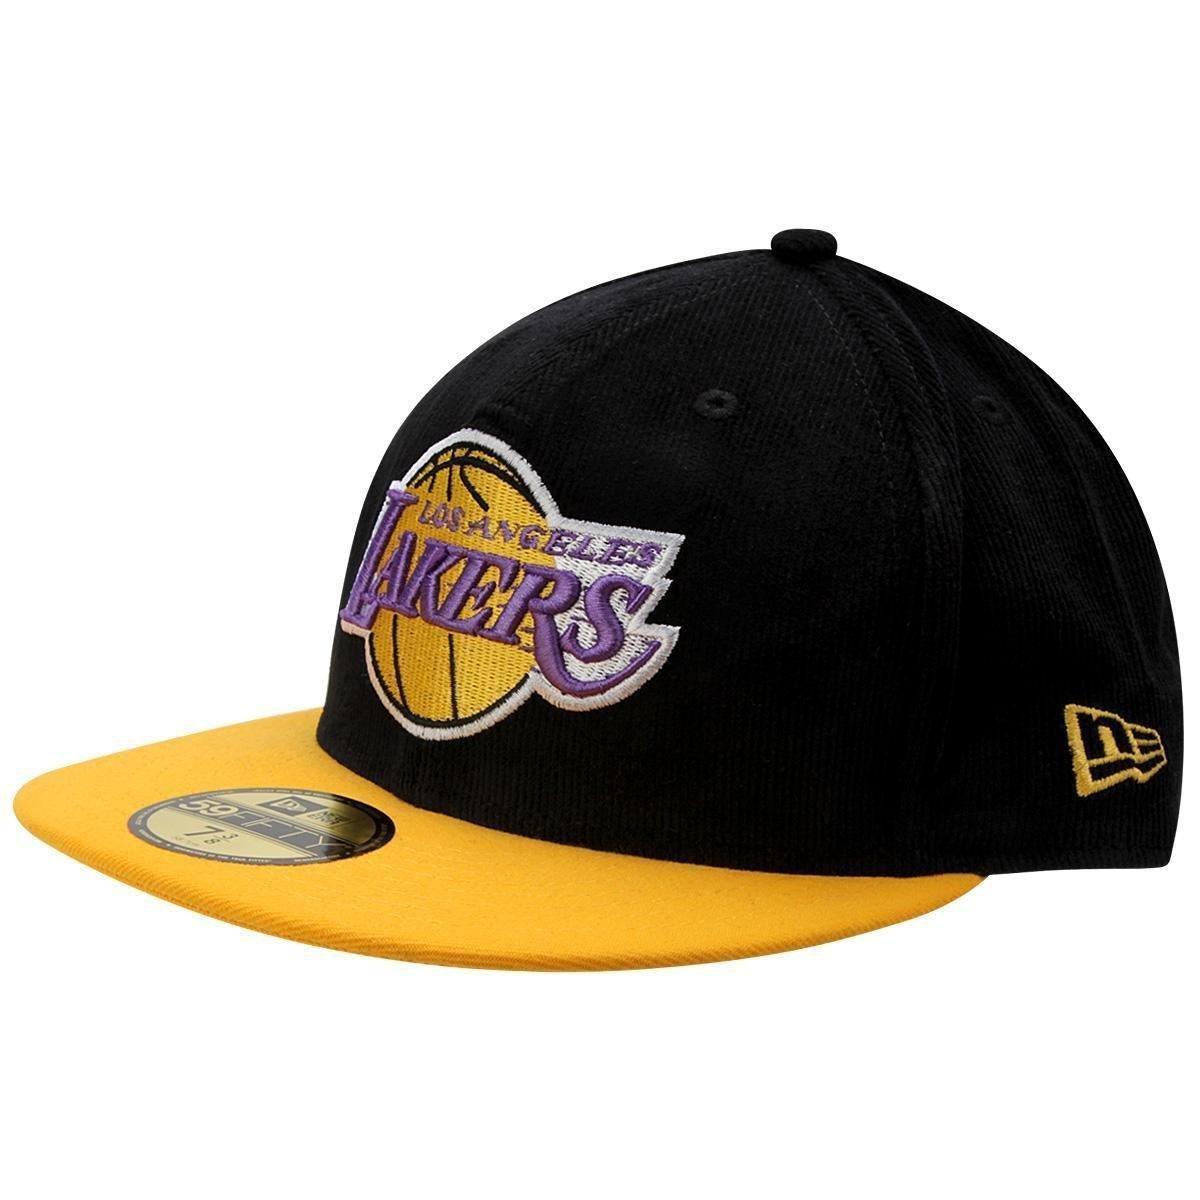 Boné New Era NBA 5950 Team Cord Los Angeles Lakers - Compre Agora ... c84fbe515fc